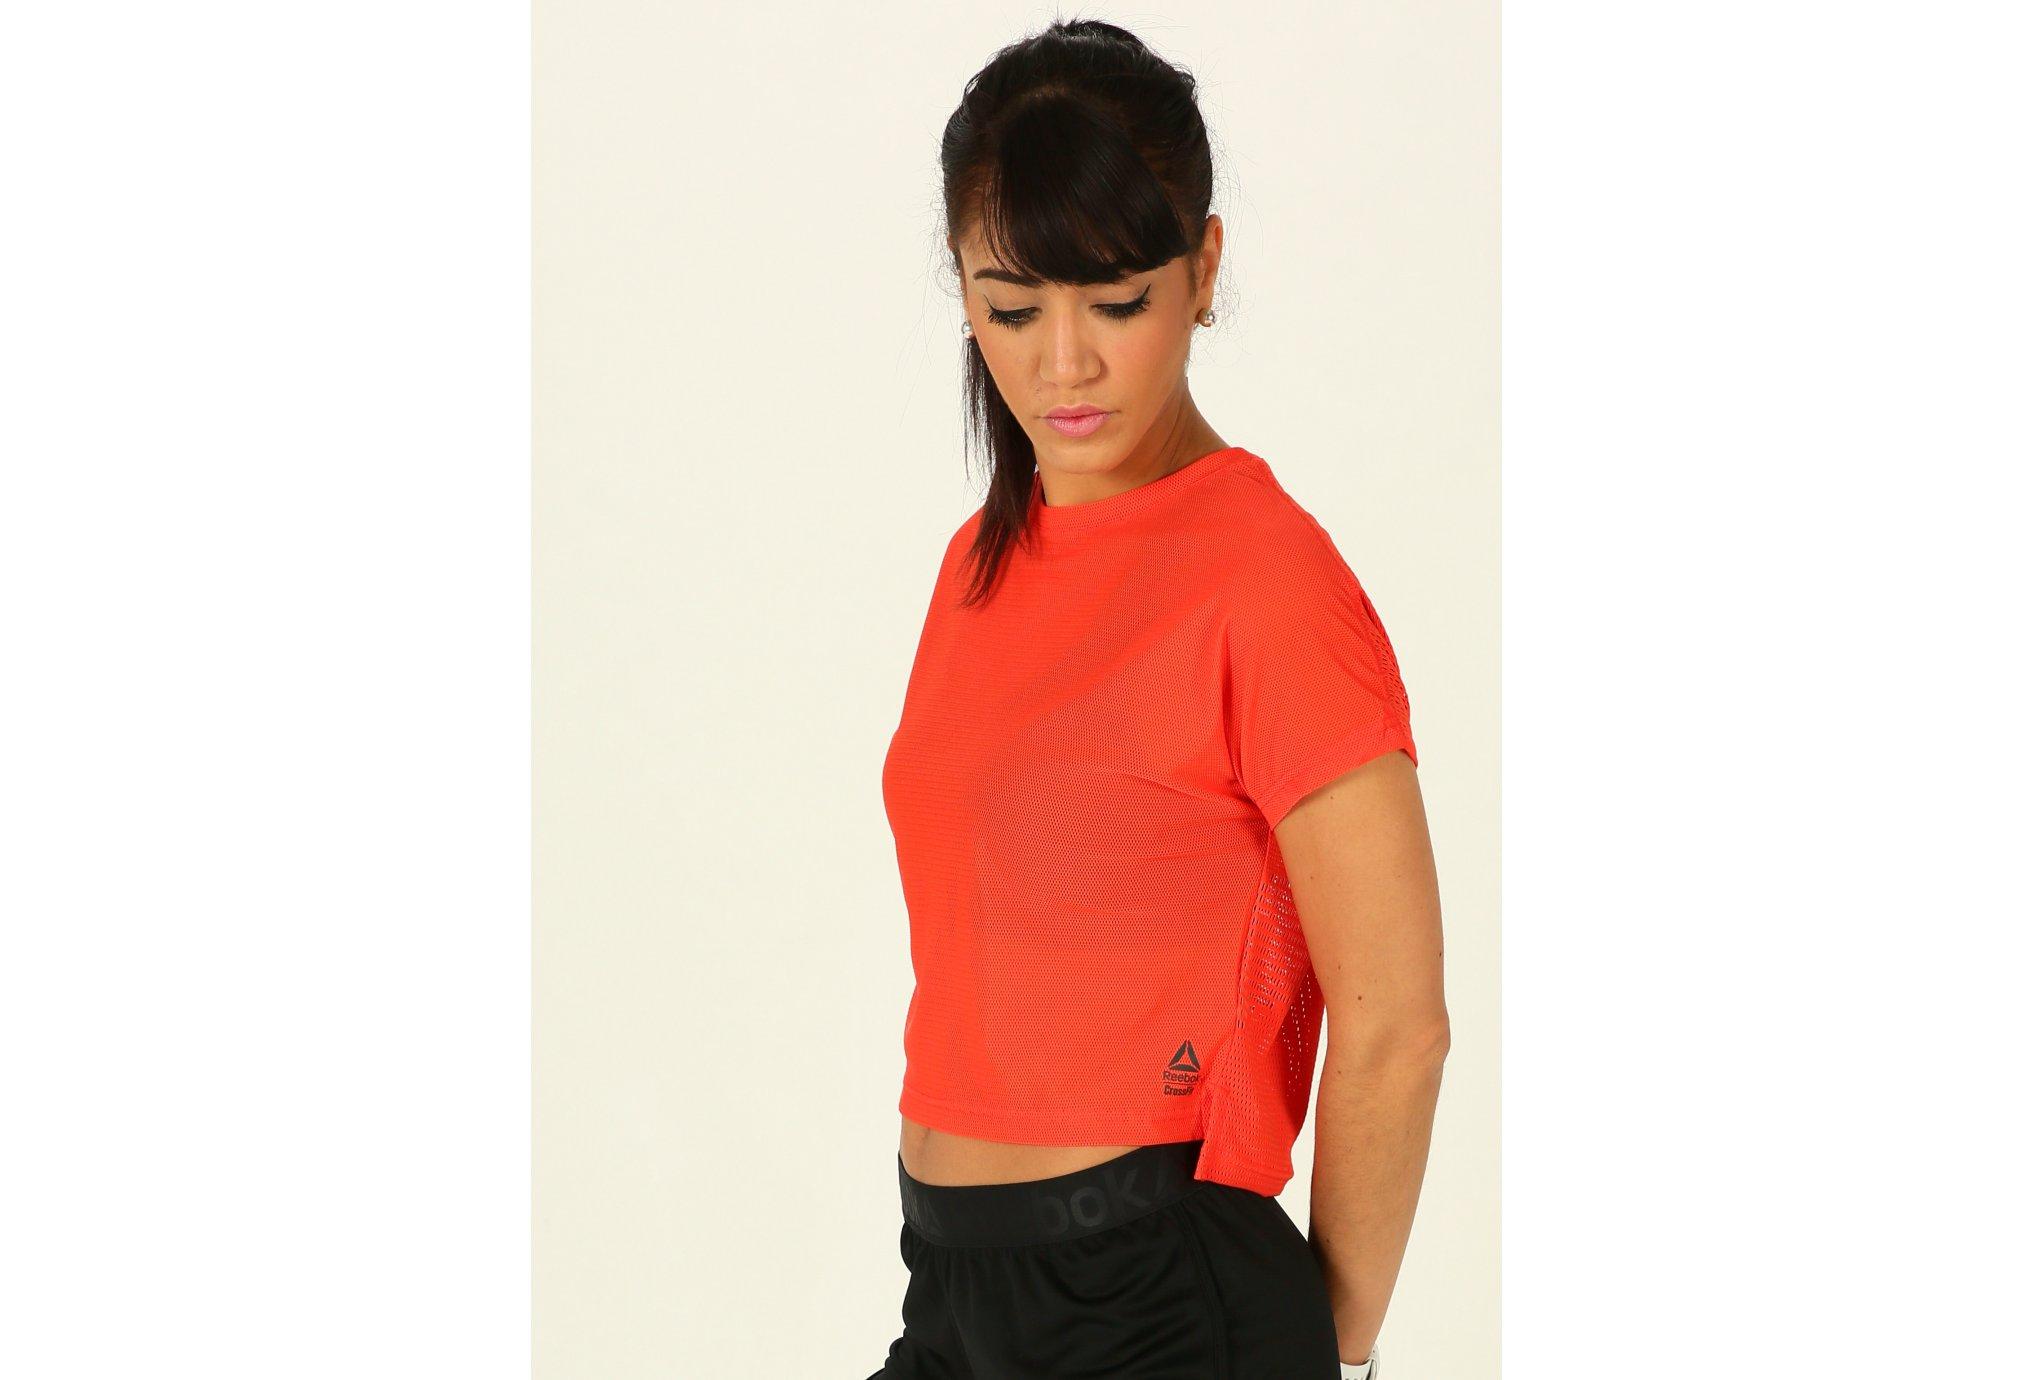 Reebok Jacquard Crossfit W vêtement running femme